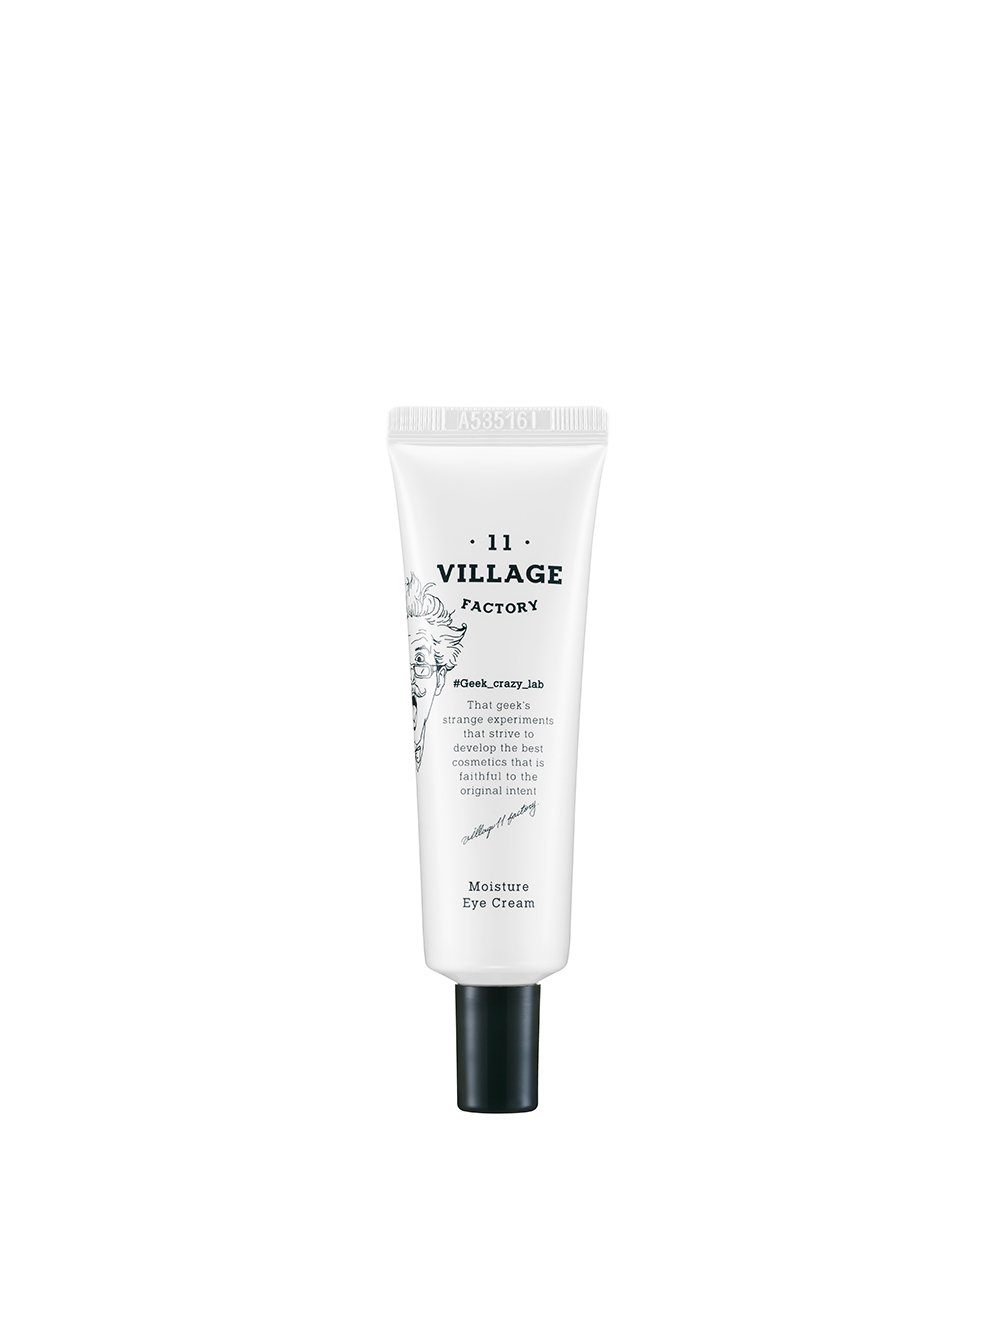 Korean Skin Care: Eye Cream, Moisturizing and Soothing Eye Cream with Natural Ingredients, Cruelty Free, Nourishing & Brightening Eye Cream for Tired Eyes, Anti Wrinkle Cream (Moisture Eye Cream 30ml)